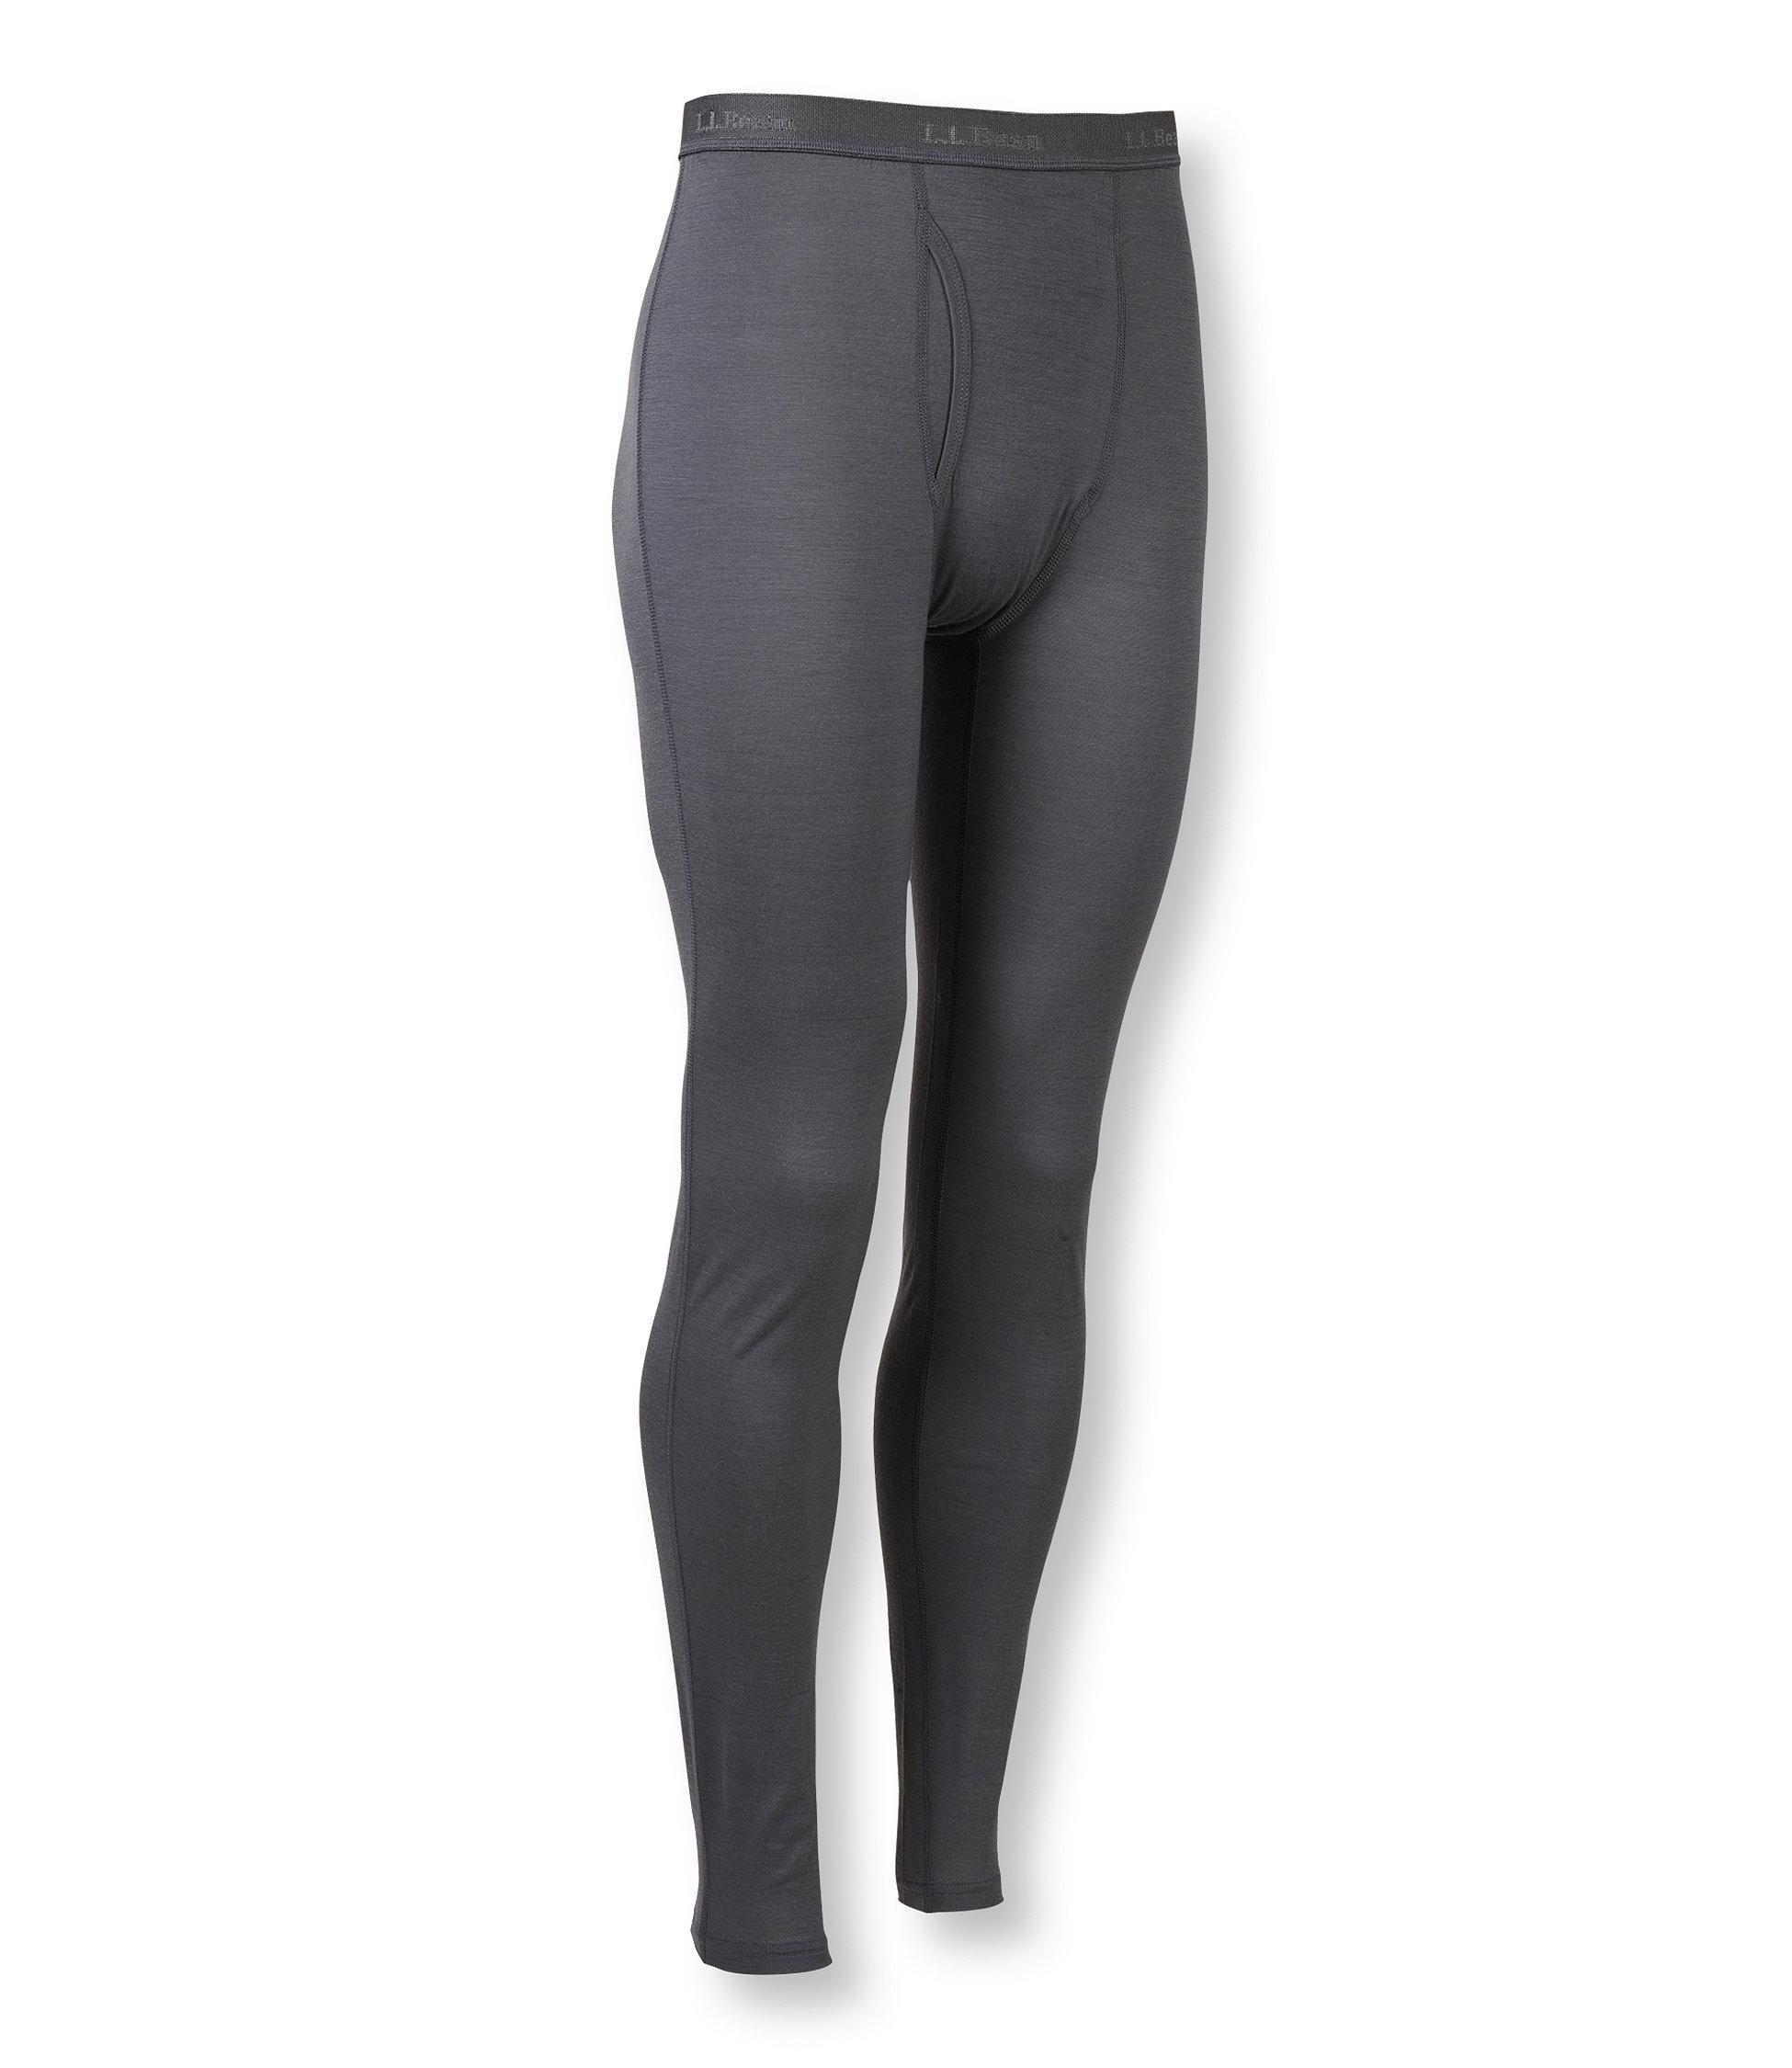 L.L.Bean Cresta Wool Ultralight Base Layer Pant